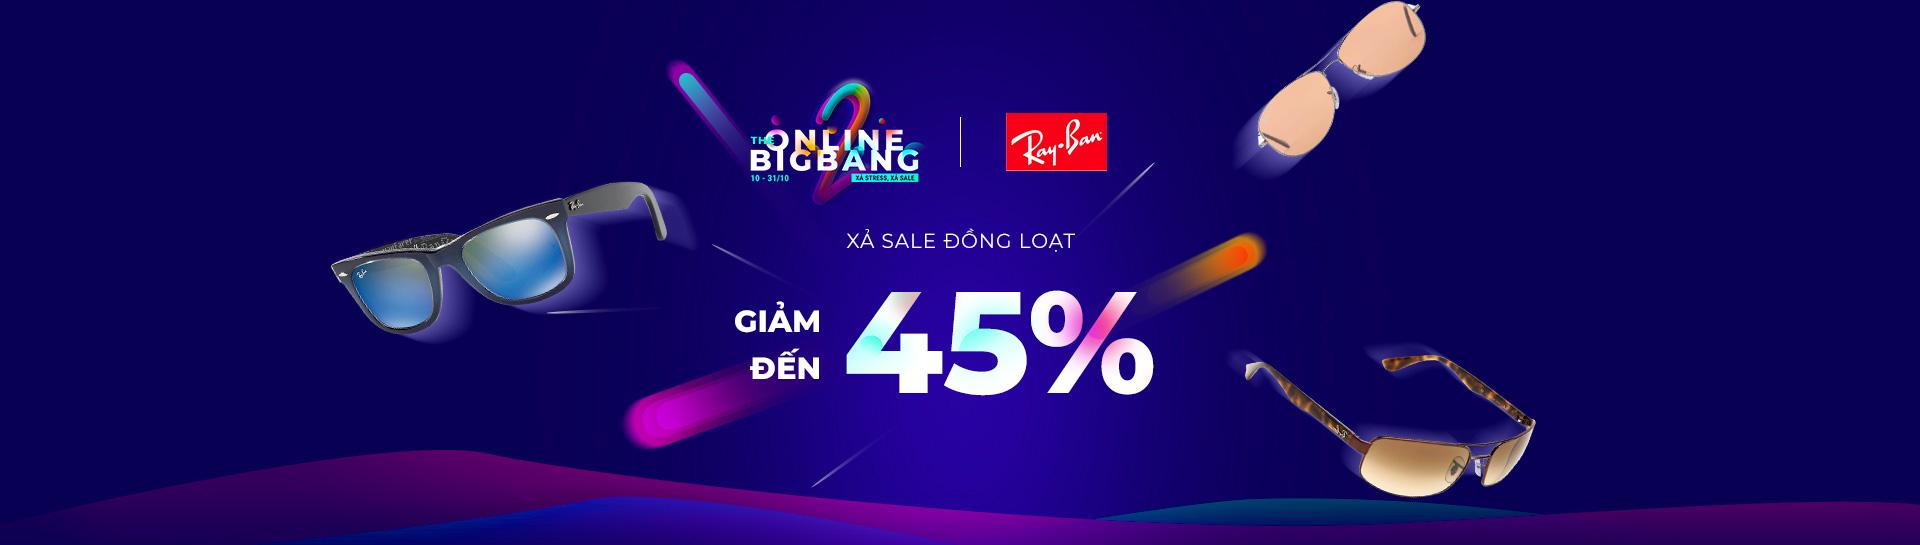 Rayban - Giảm đến 40%